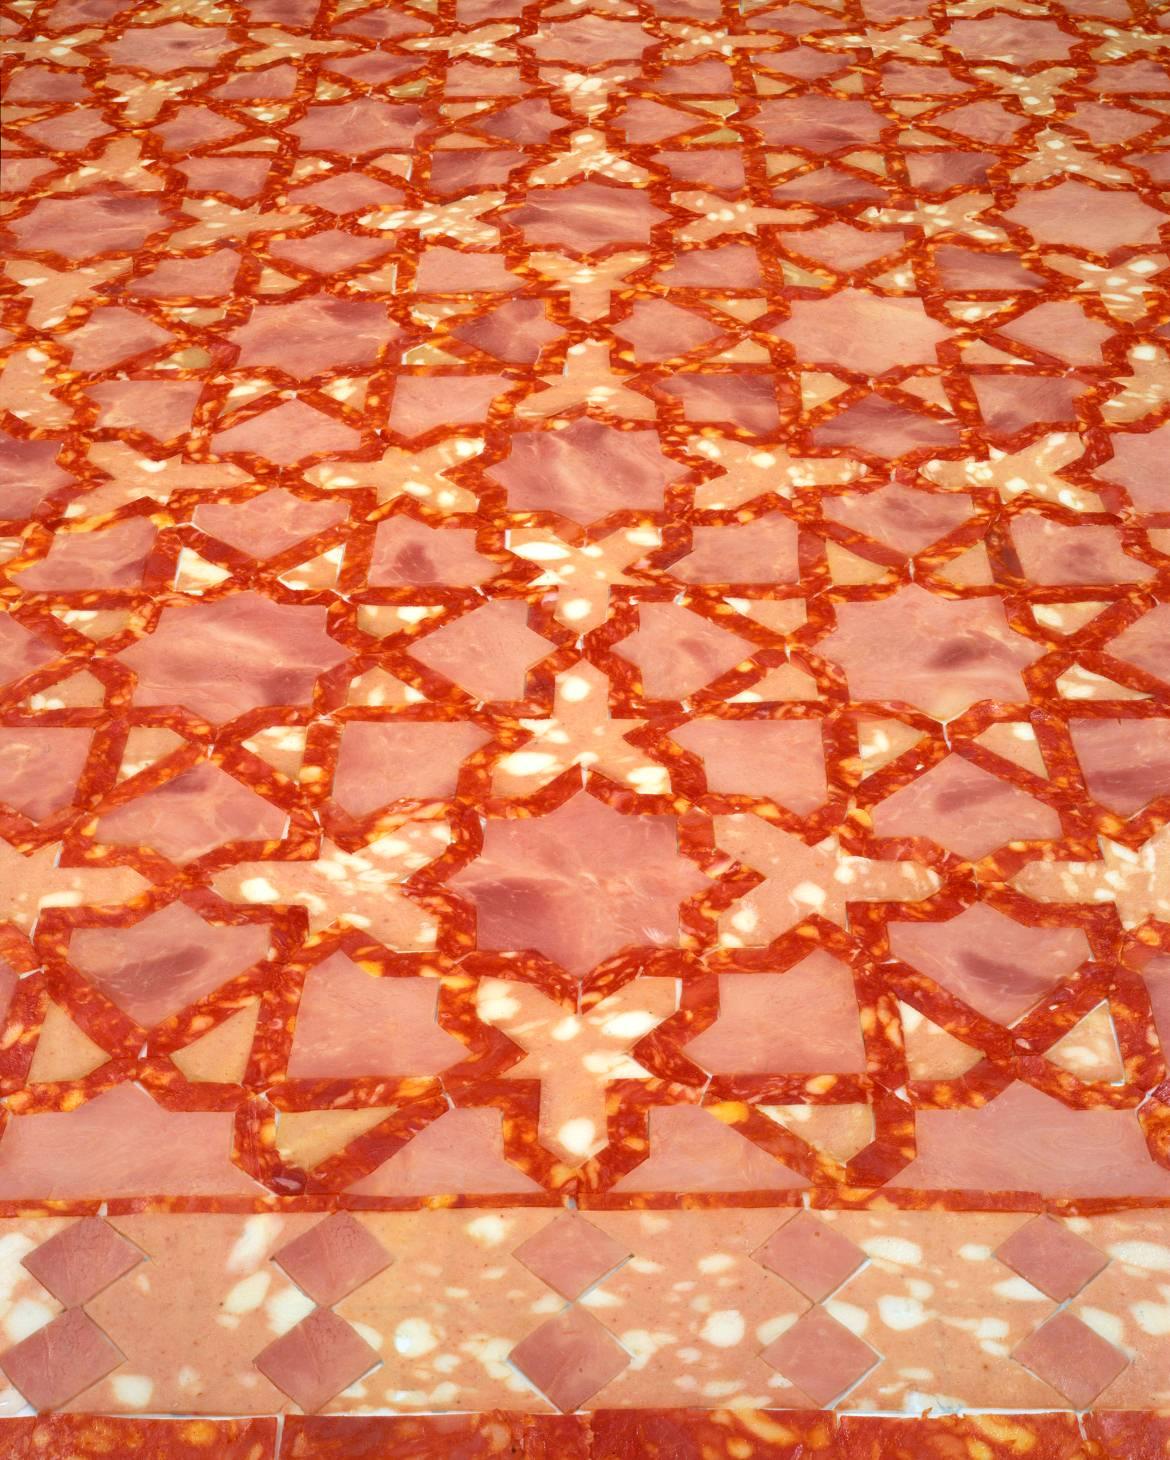 Wim Delvoye, Marble Floor, 2000, 125 x 100cm, cibachrome on aluminium